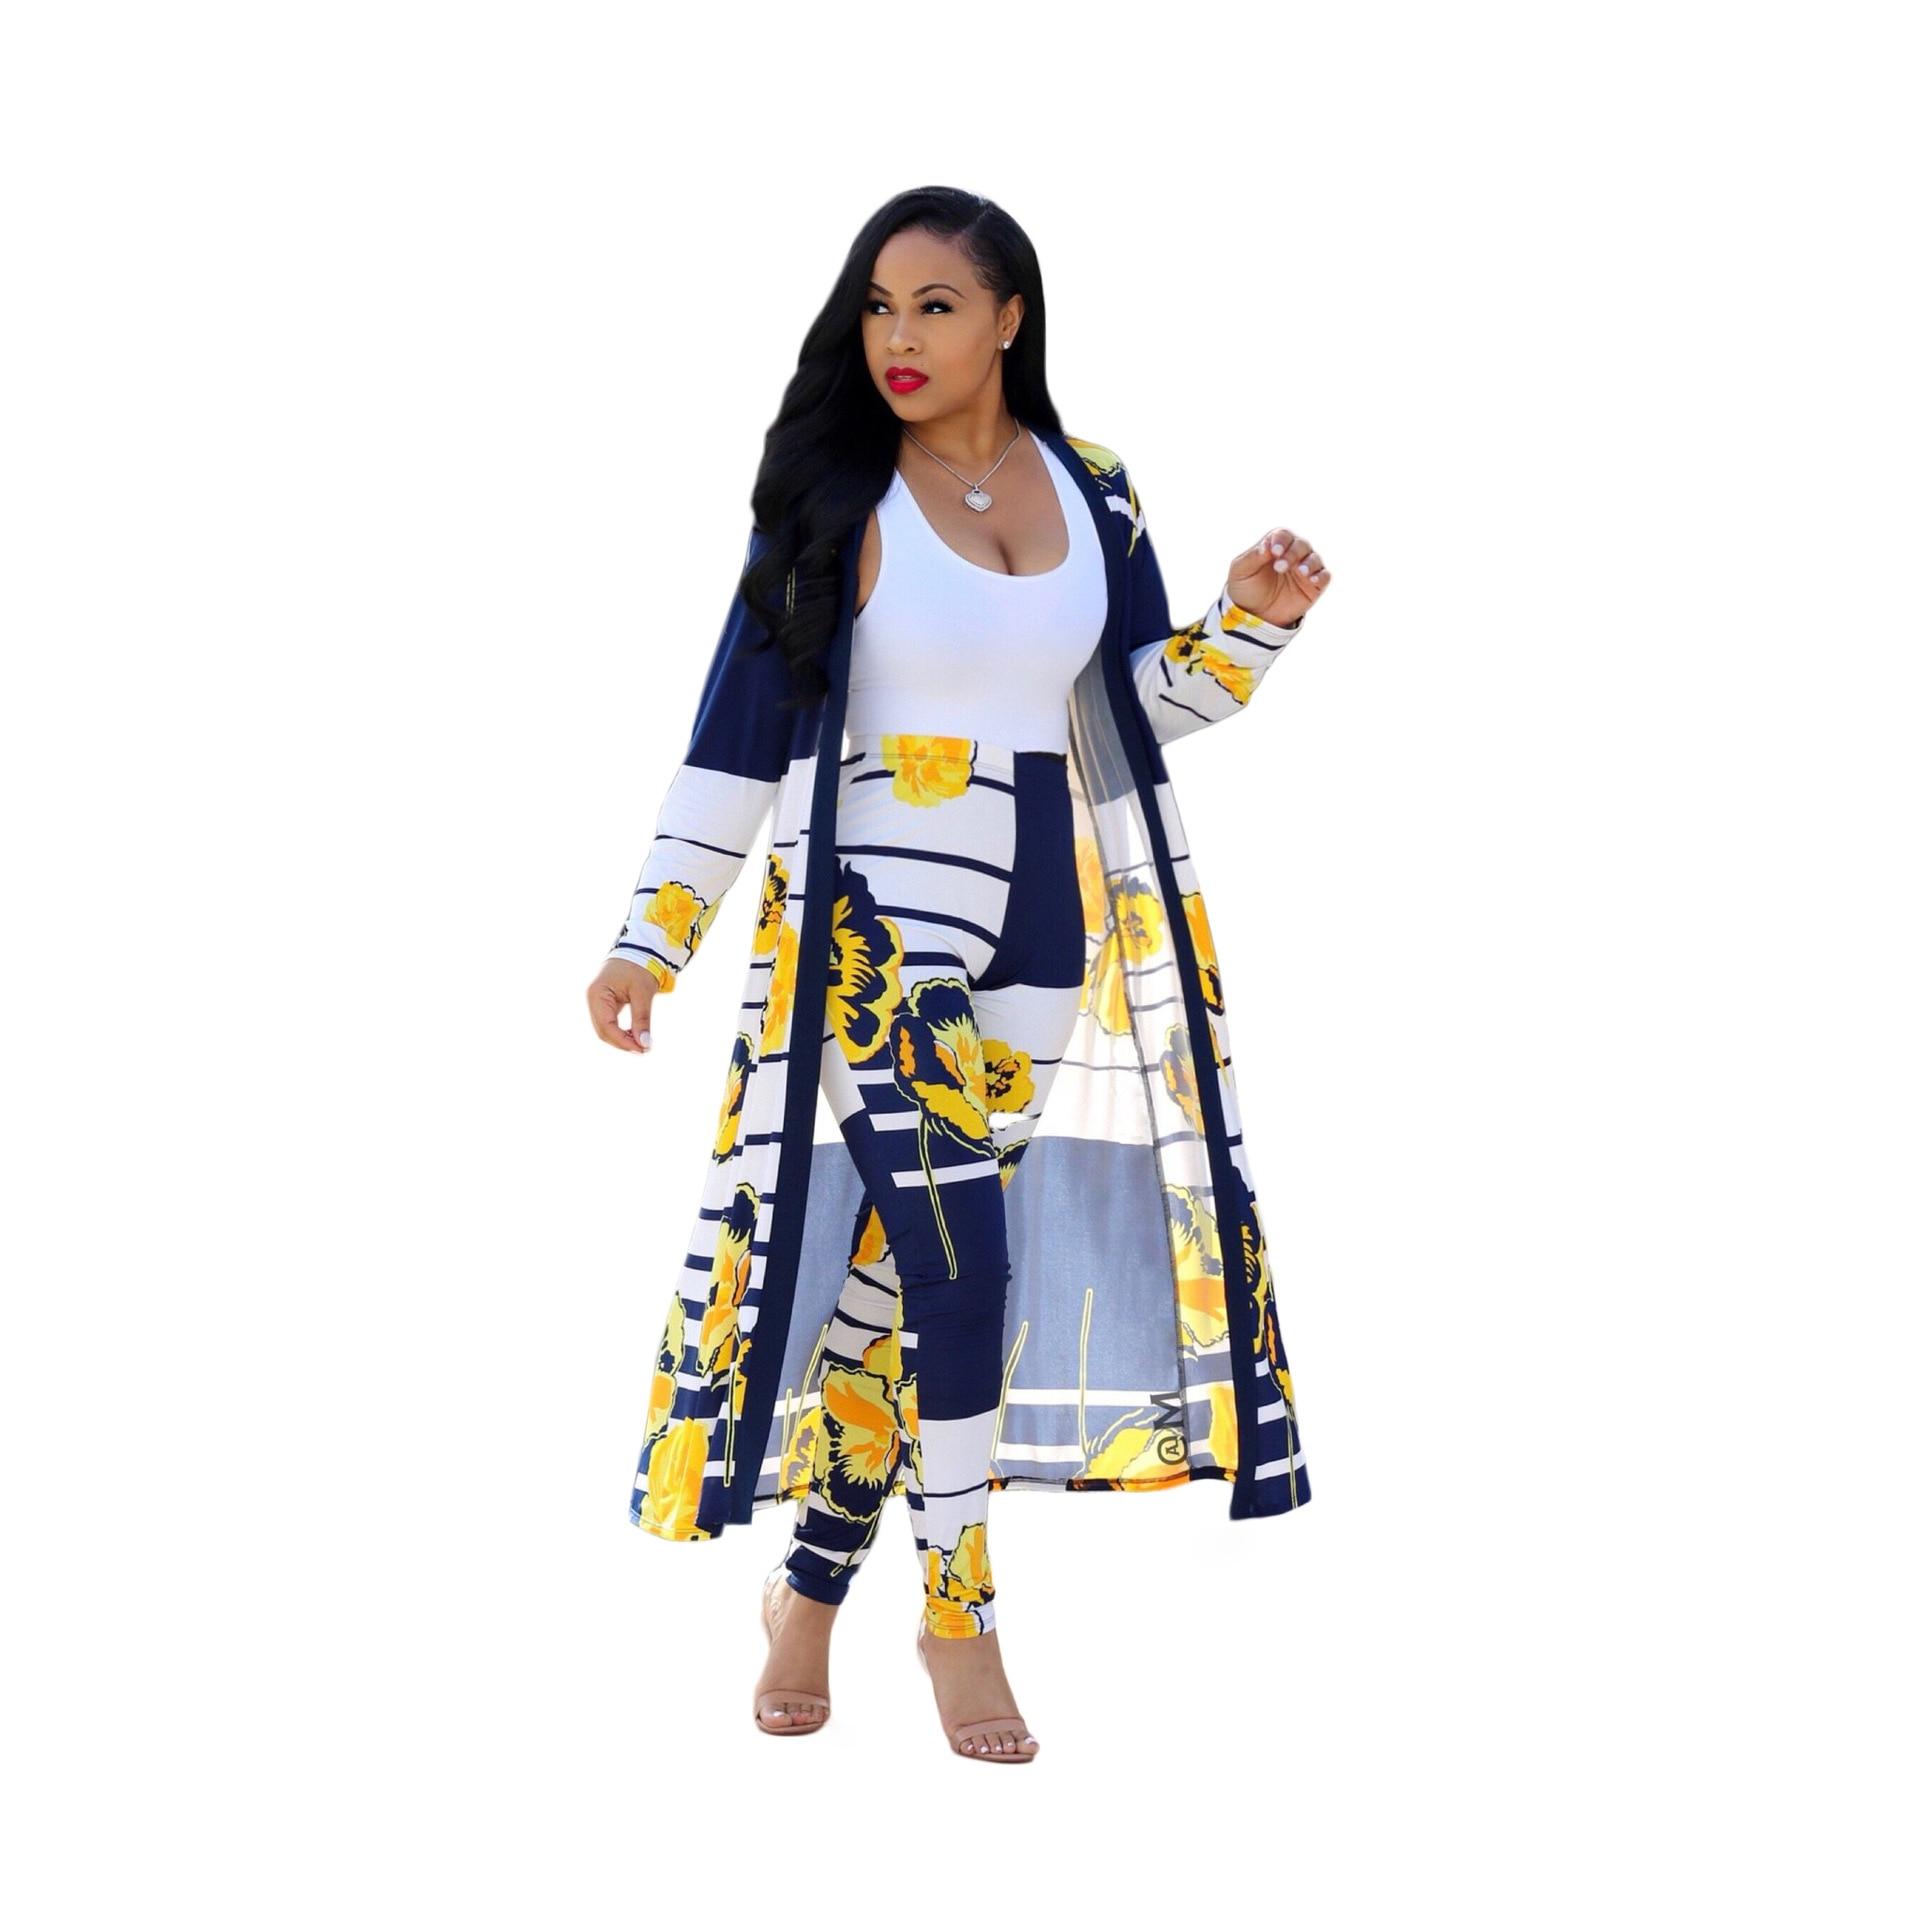 Mujer 2 piezas Ponchos otoño retazos manga larga abrigo femenino amarillo azul capa suelta mujeres abierto Stitc traje y largo conjunto de pantalones